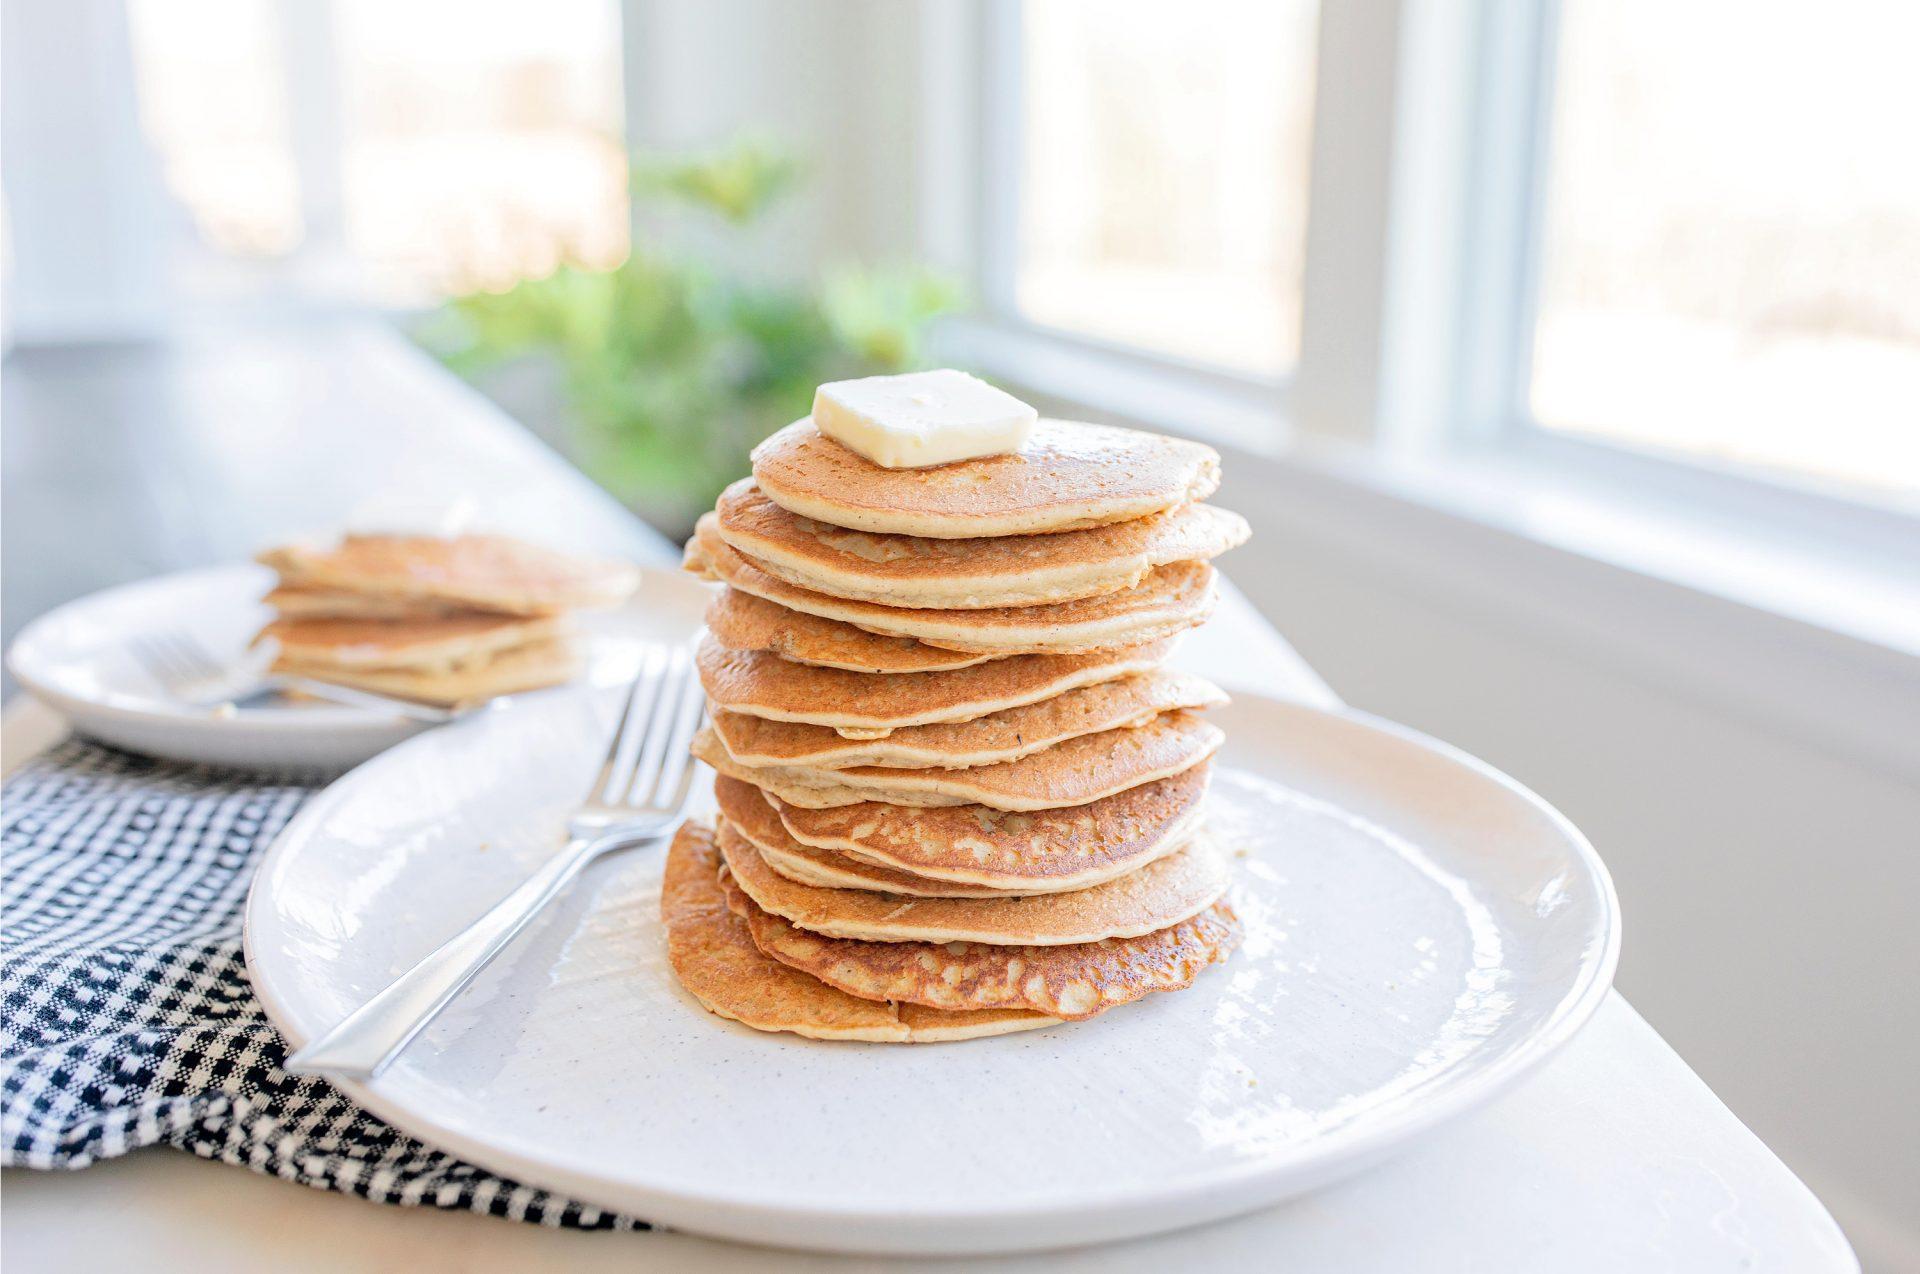 dairy free, gluten free, low carb, keto, pancakes, keto breakfast, low carb pancakes, pancakes for breakfast, no carb, careless, low carb diet, pancake recipe